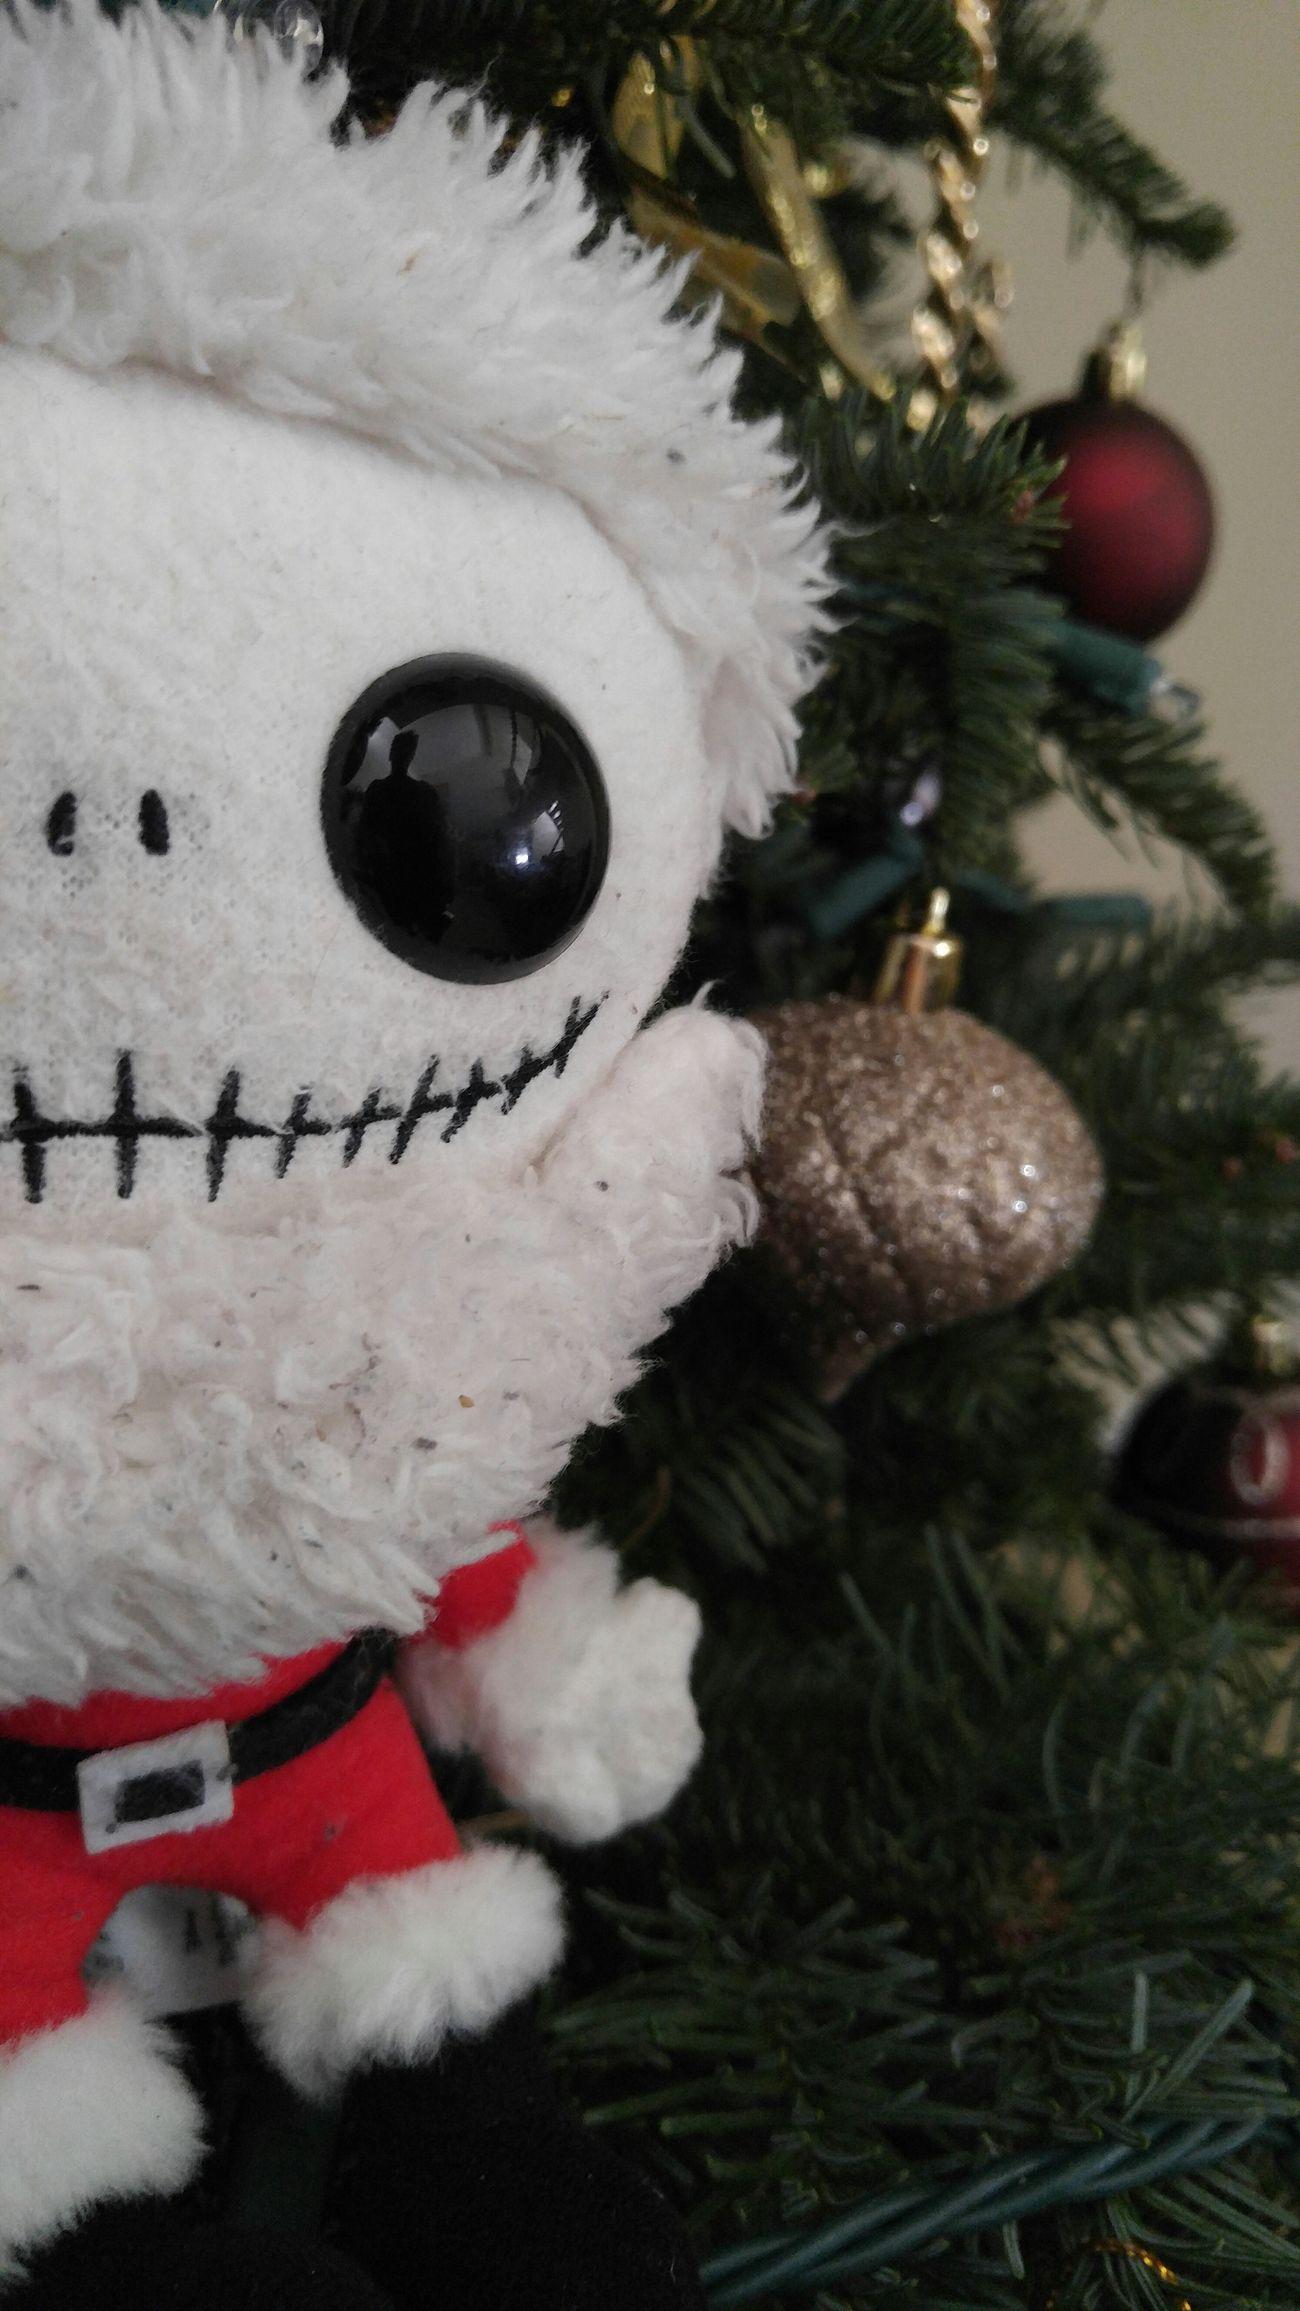 Its beginning to look a lot like Christmas. JackSkellington TheNightmareBeforeChristmas Timburton Christmas